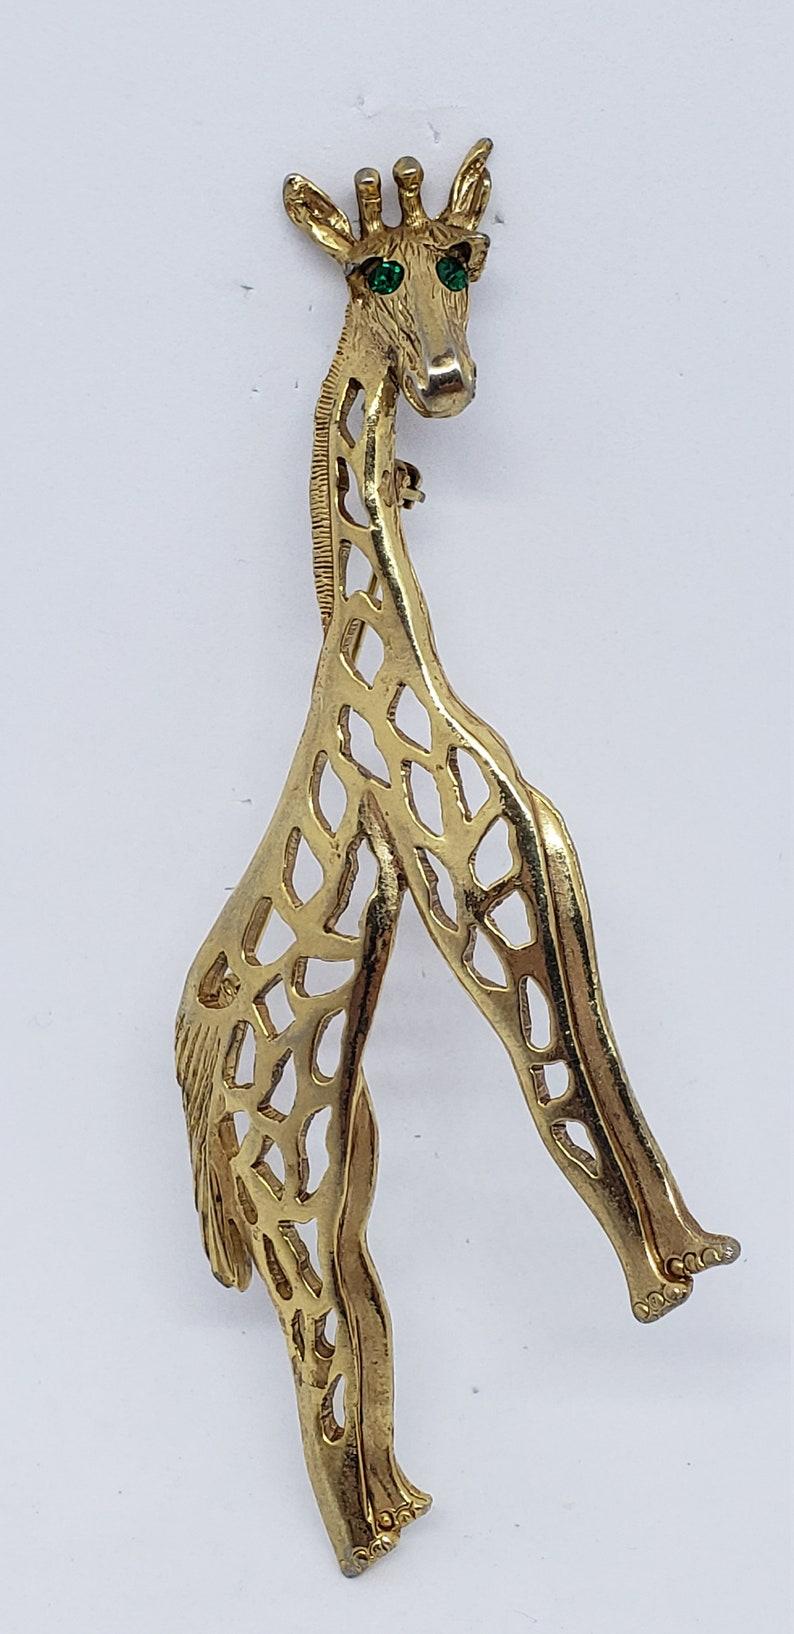 Vintage Large Golden Giraffe Brooch